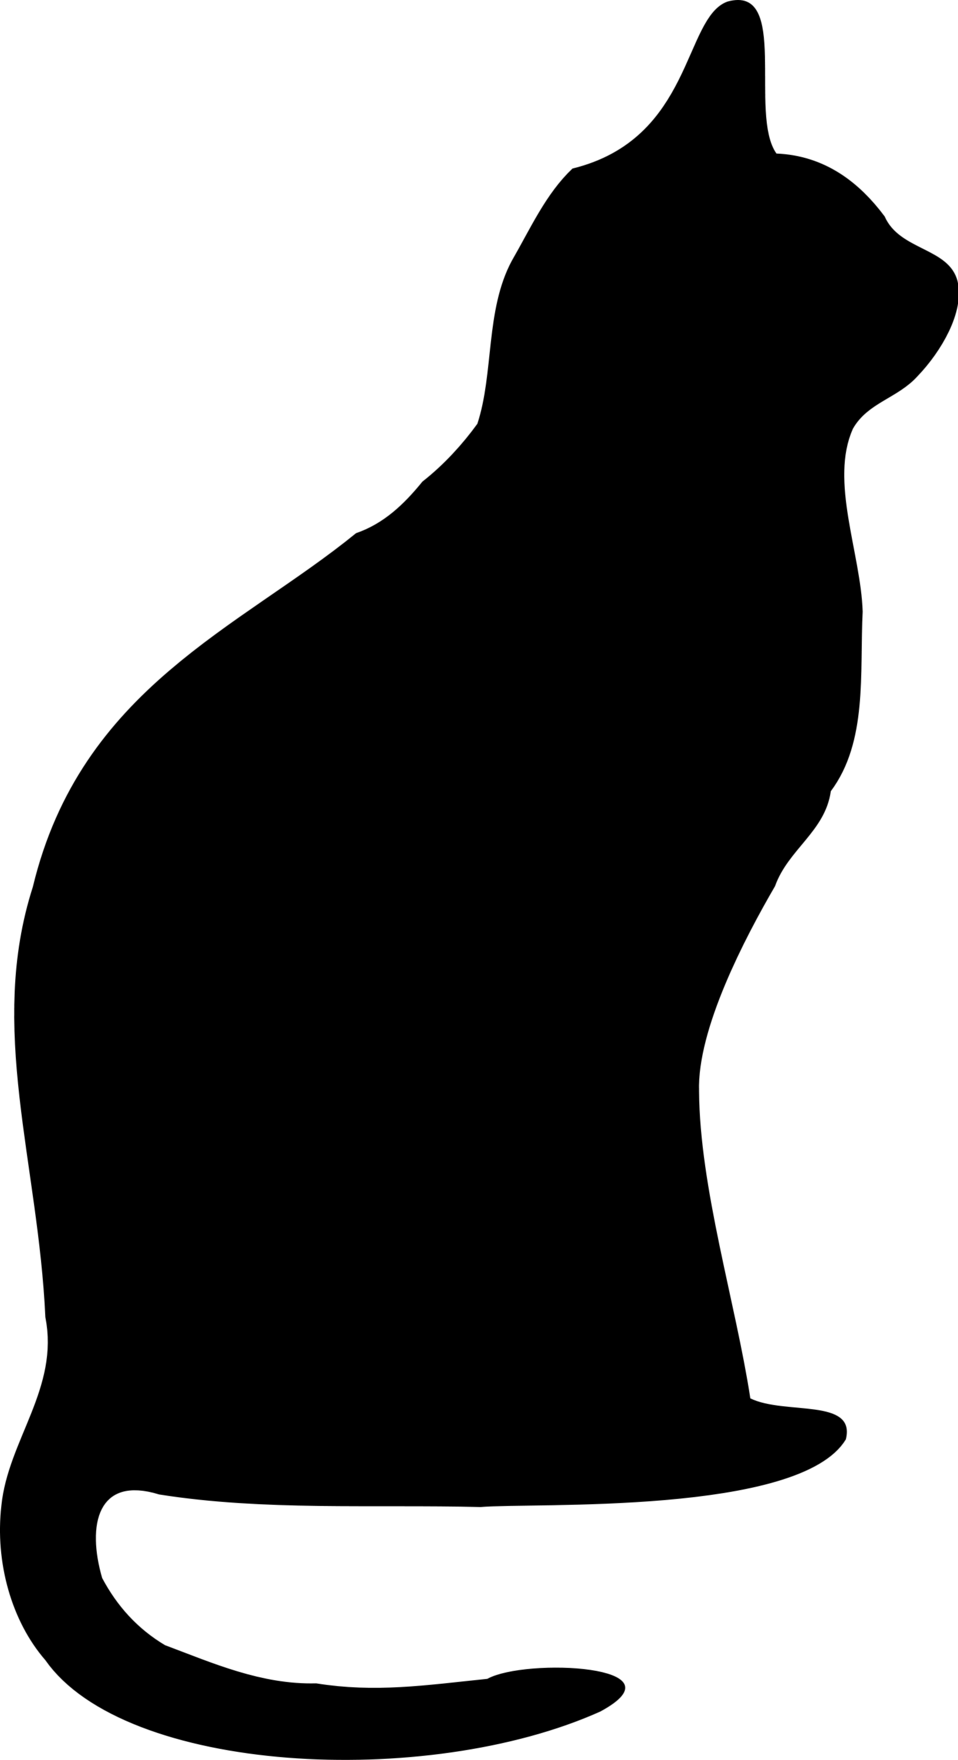 958x1760 Image